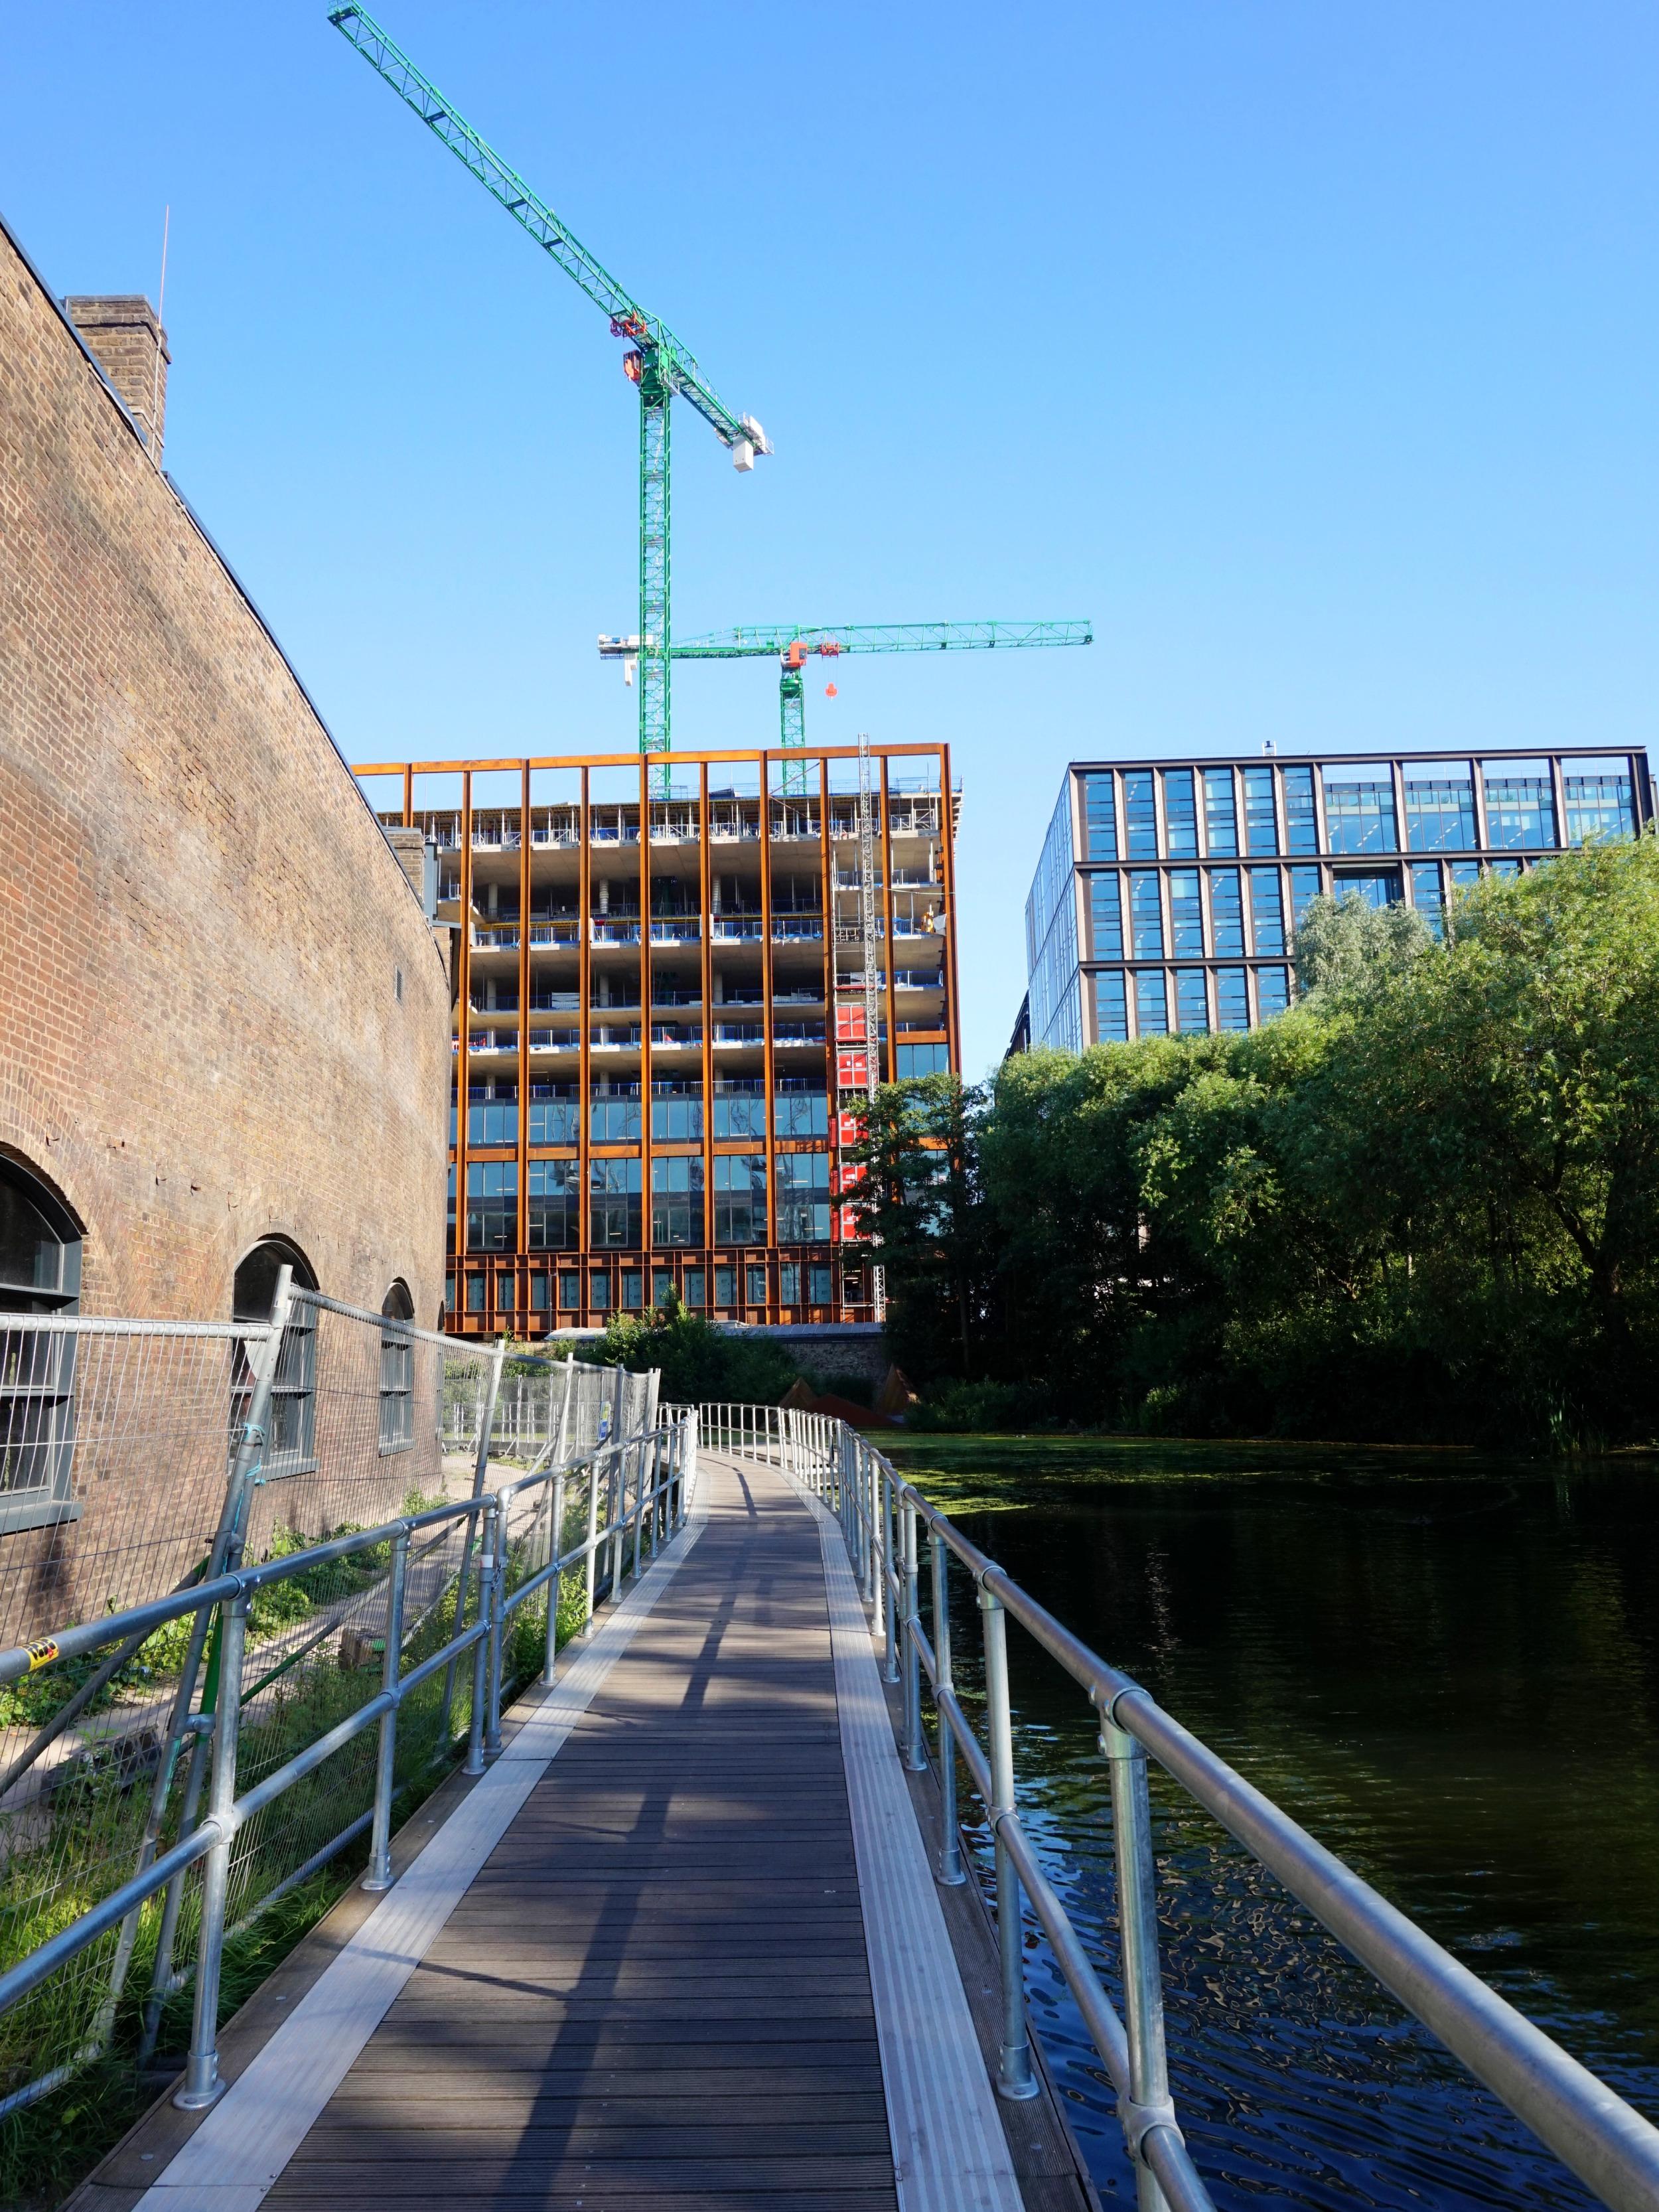 Regents-Canal-69